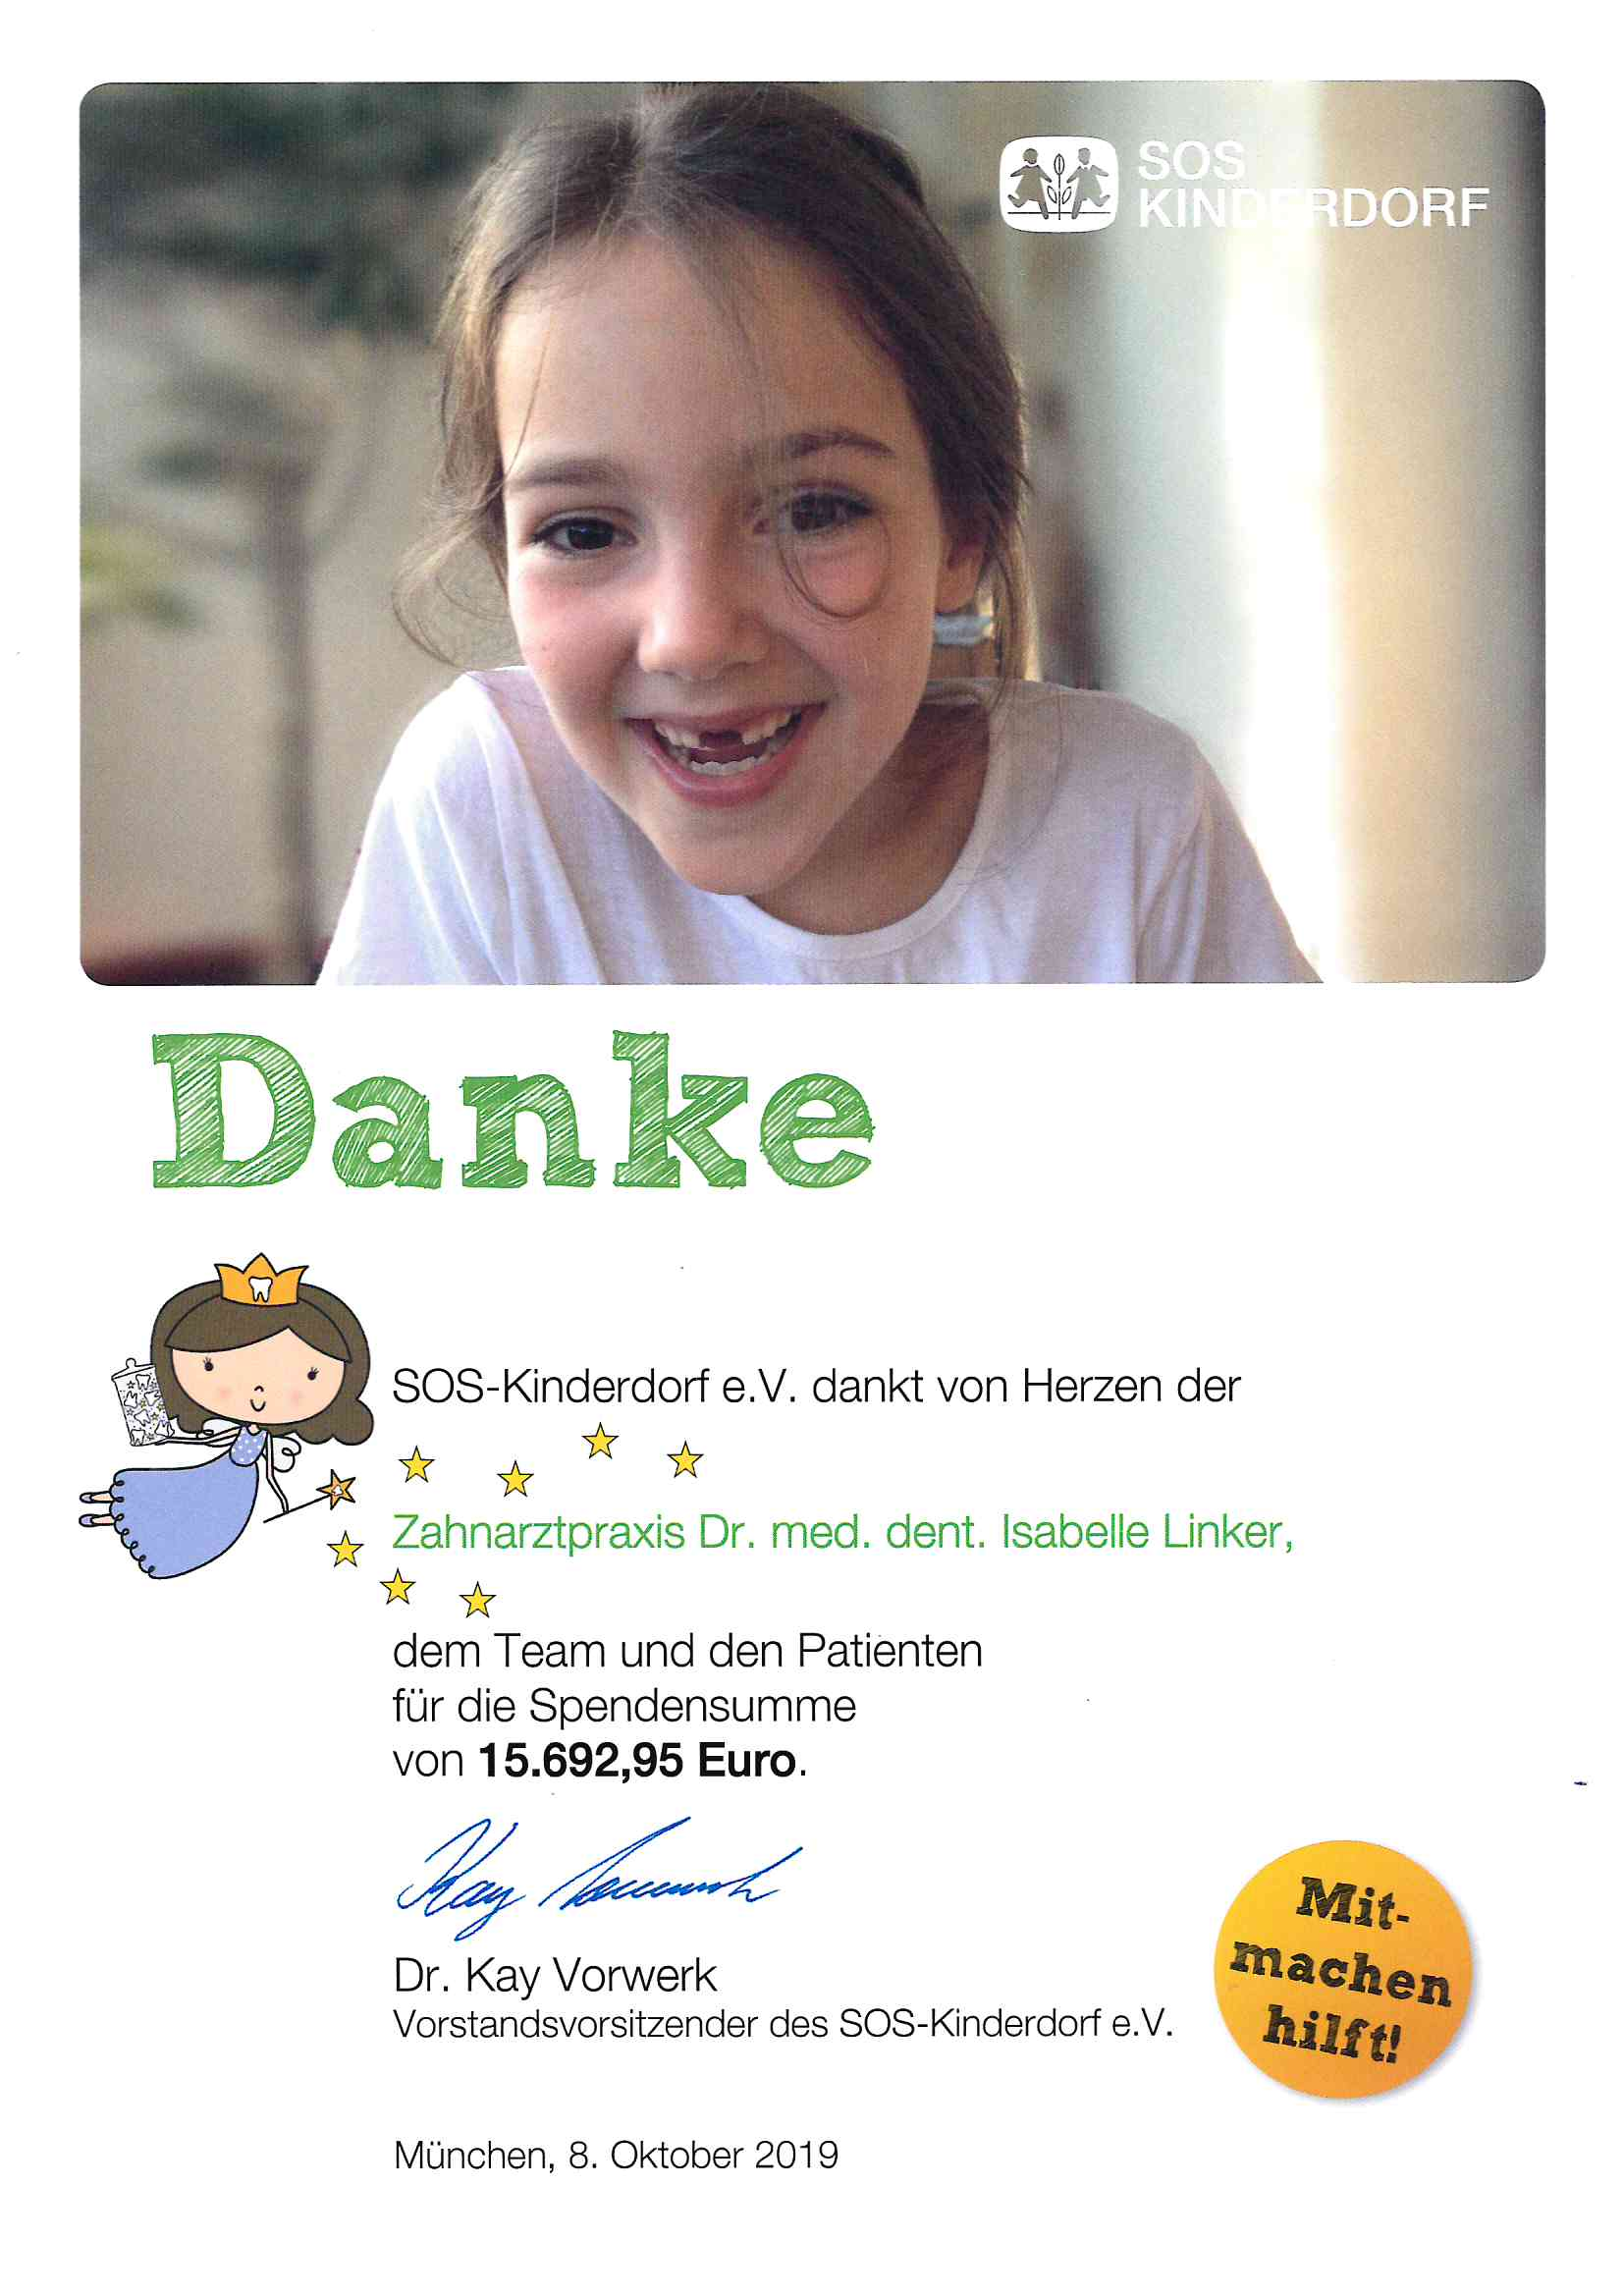 SOS-Kinderdorf-Spendensumme 2019